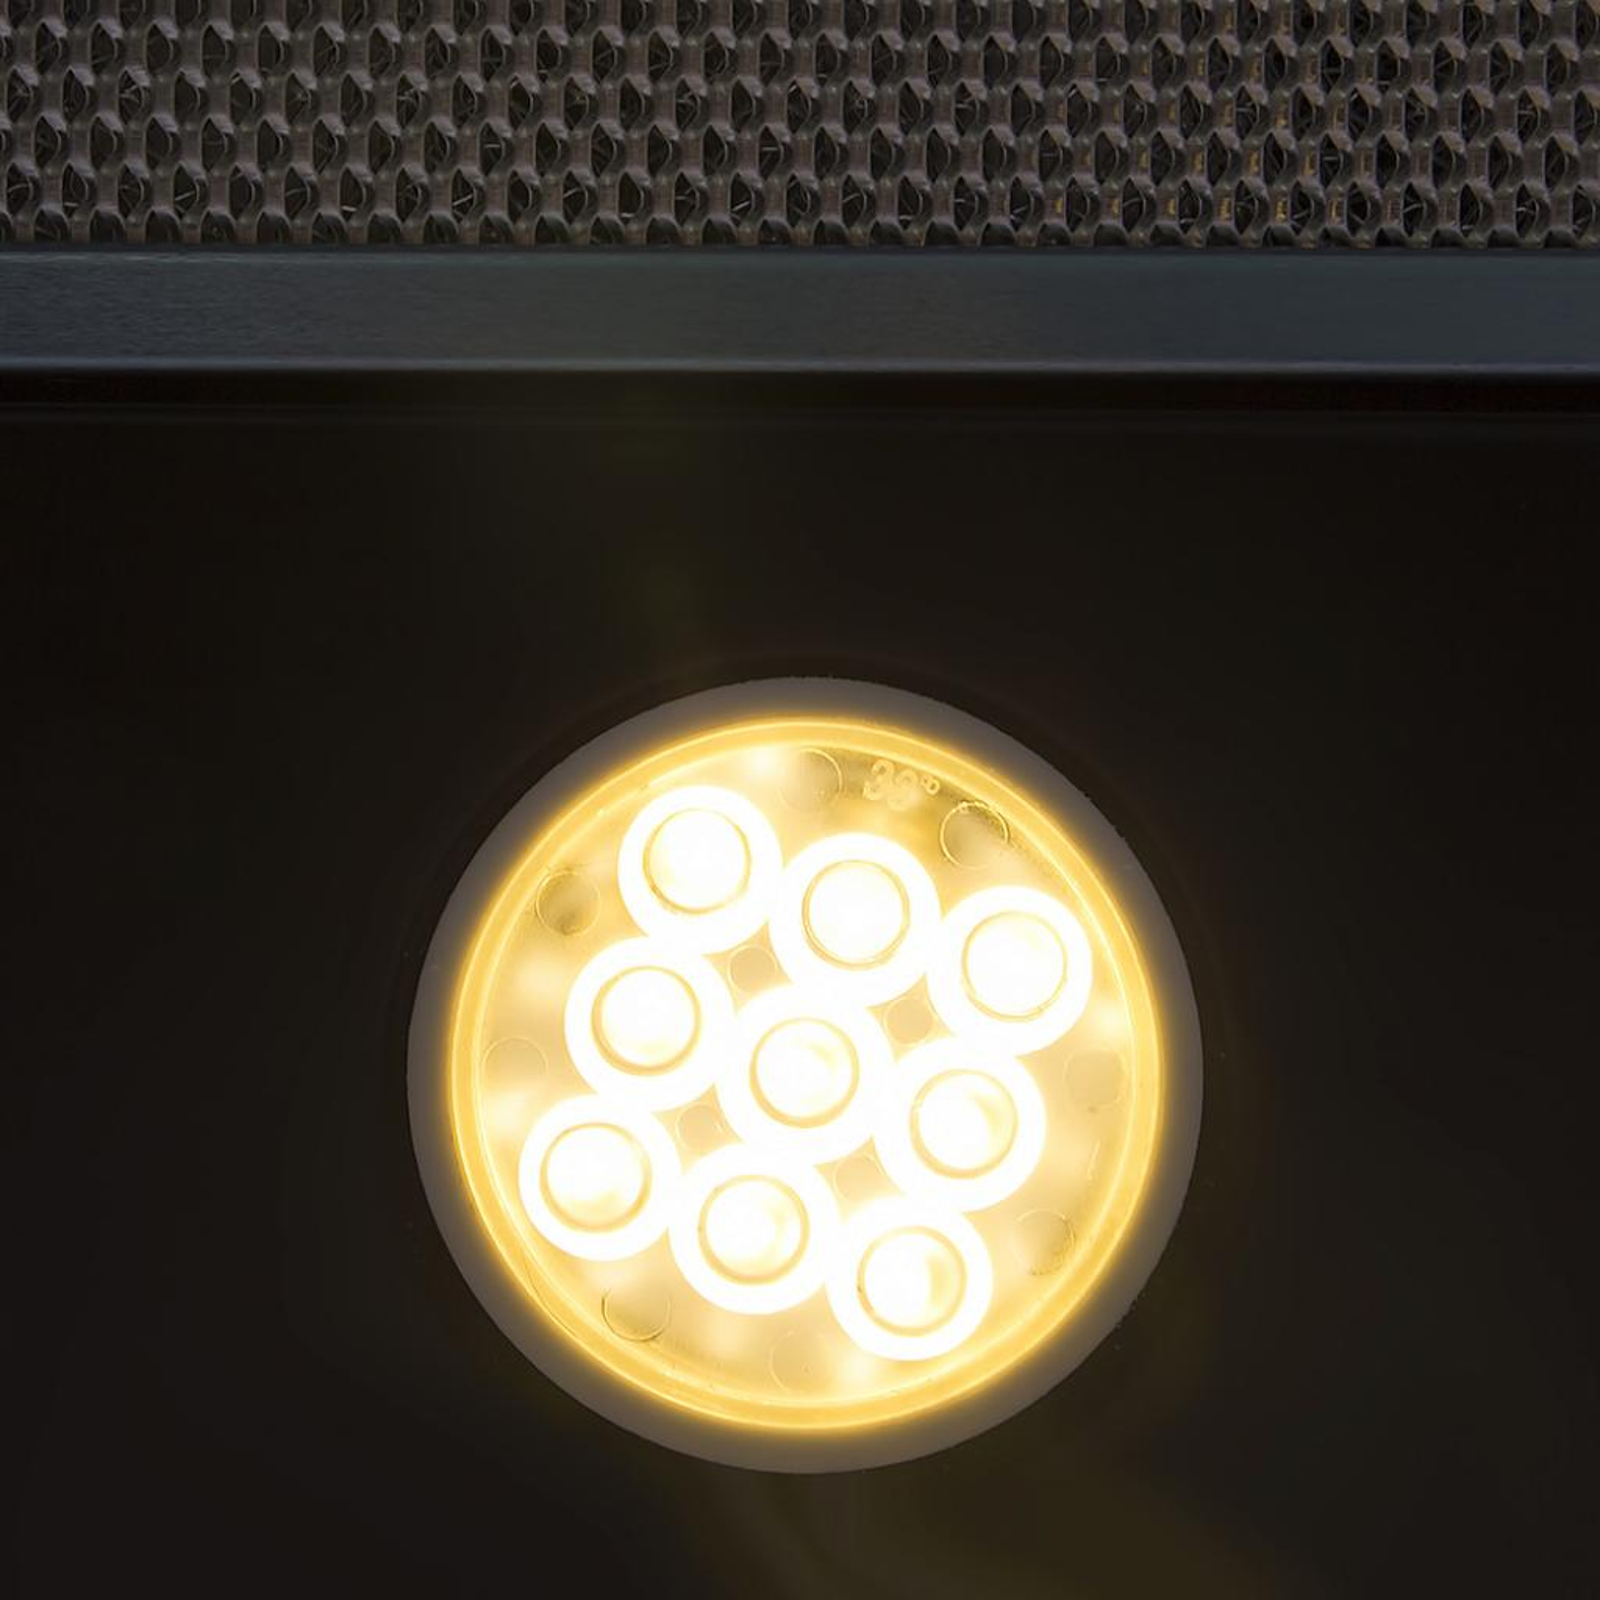 Вытяжка кухонная PERFELLI TLS 6832 W LED изображение 7